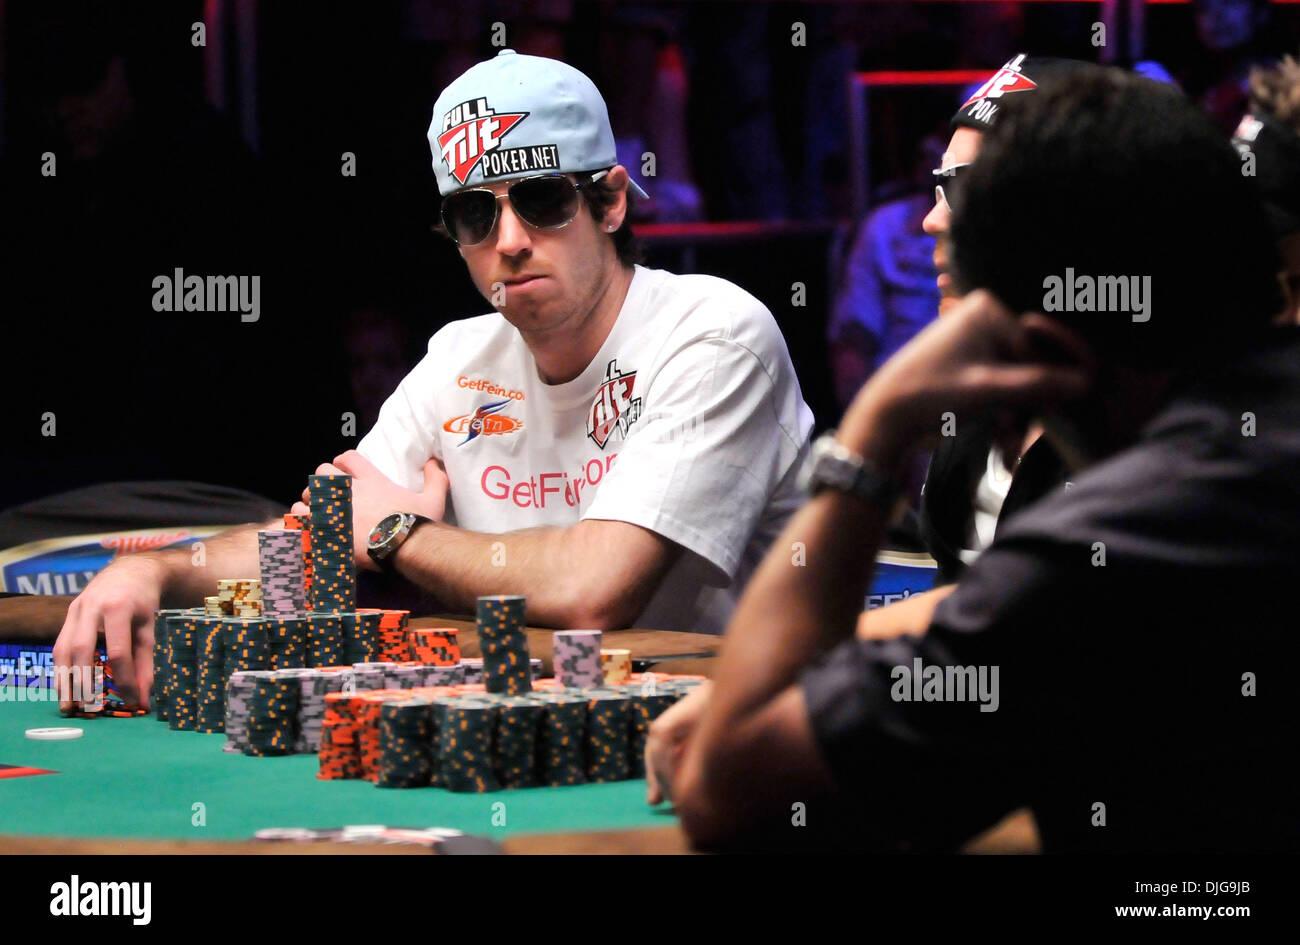 Poker players in vegas